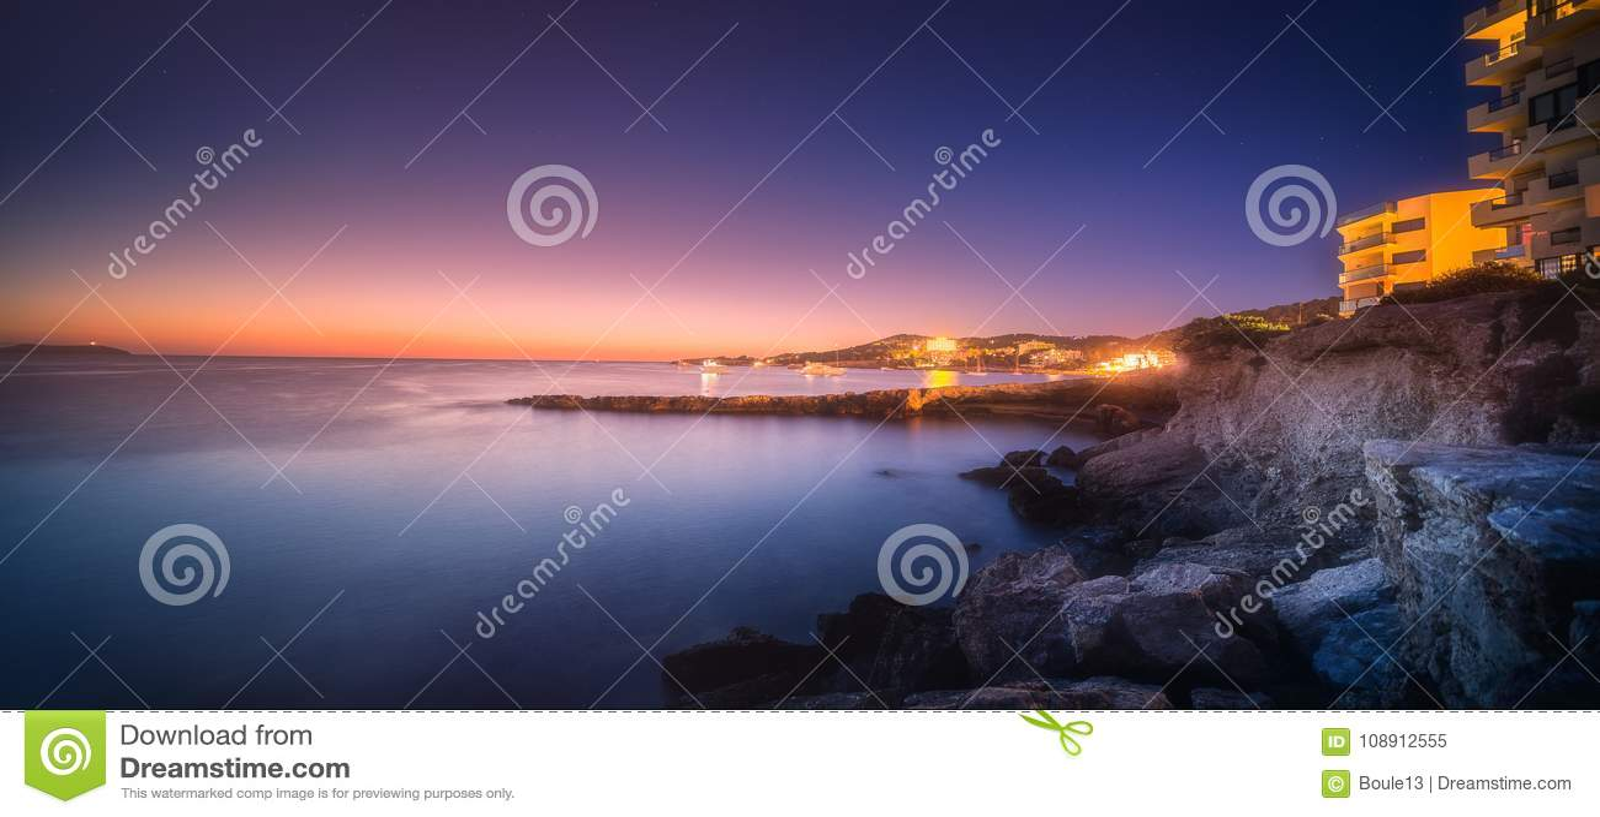 Sunset view of San Antonio beach and Ibiza, Spain